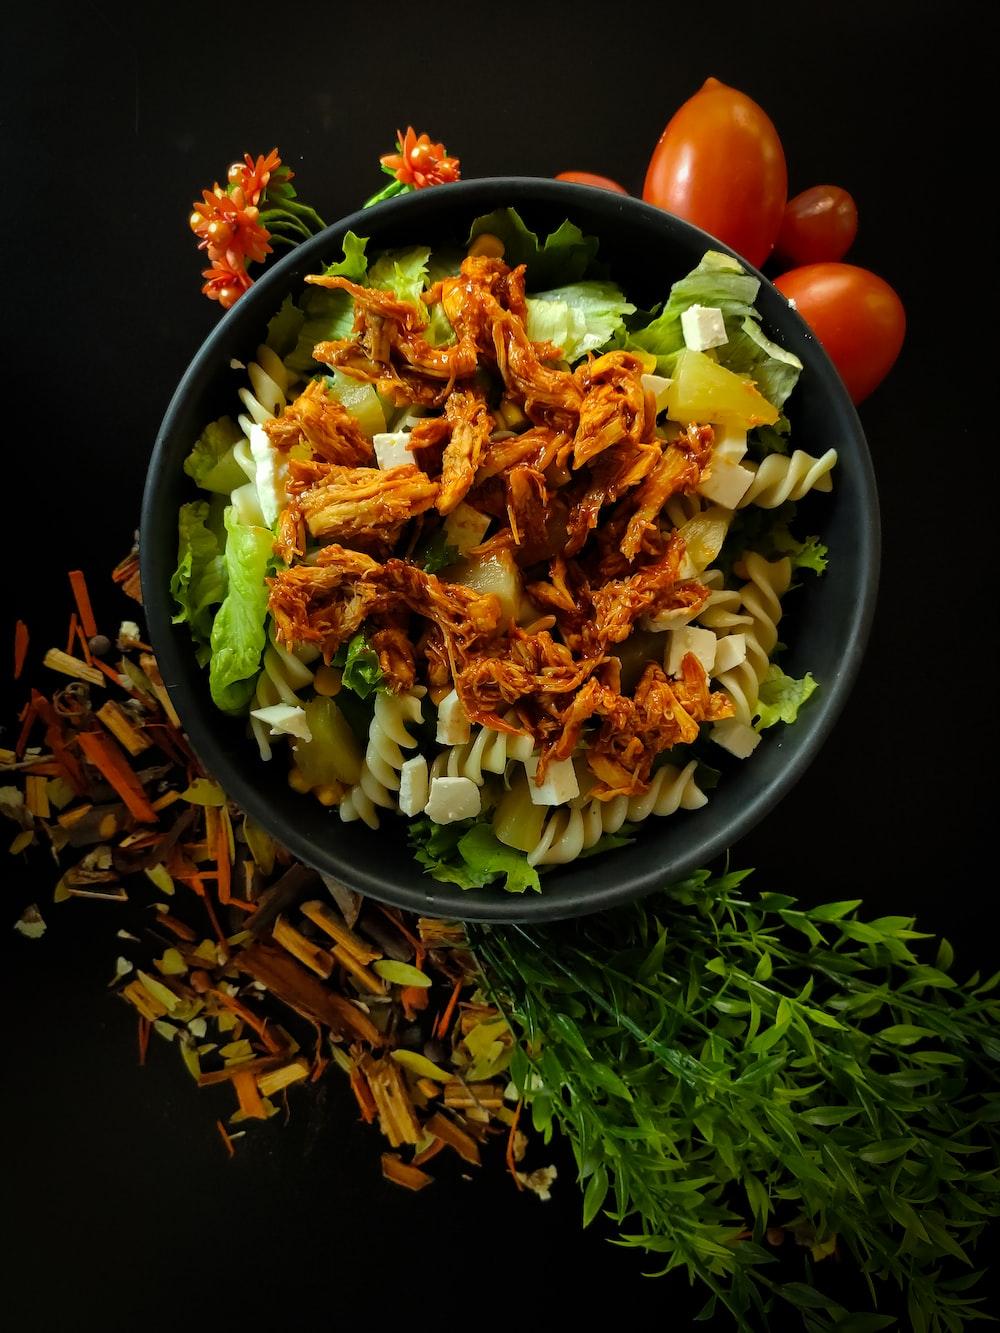 vegetable salad in black ceramic bowl